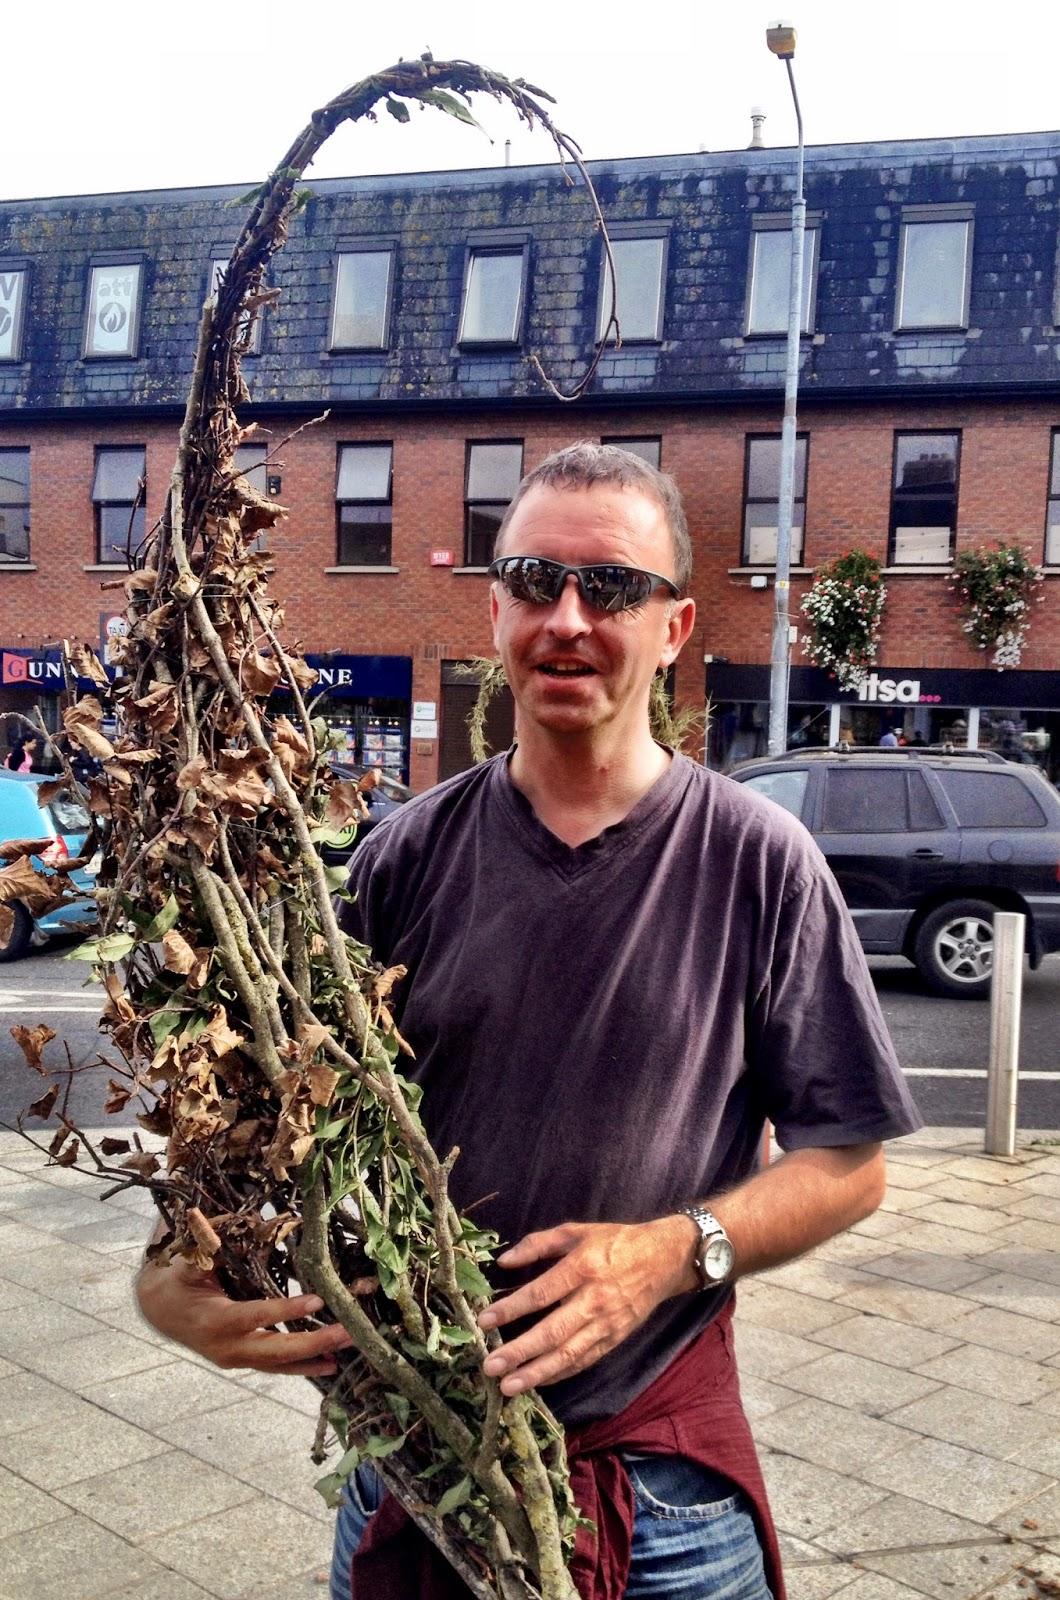 Mark Reid posing with Scoodoo